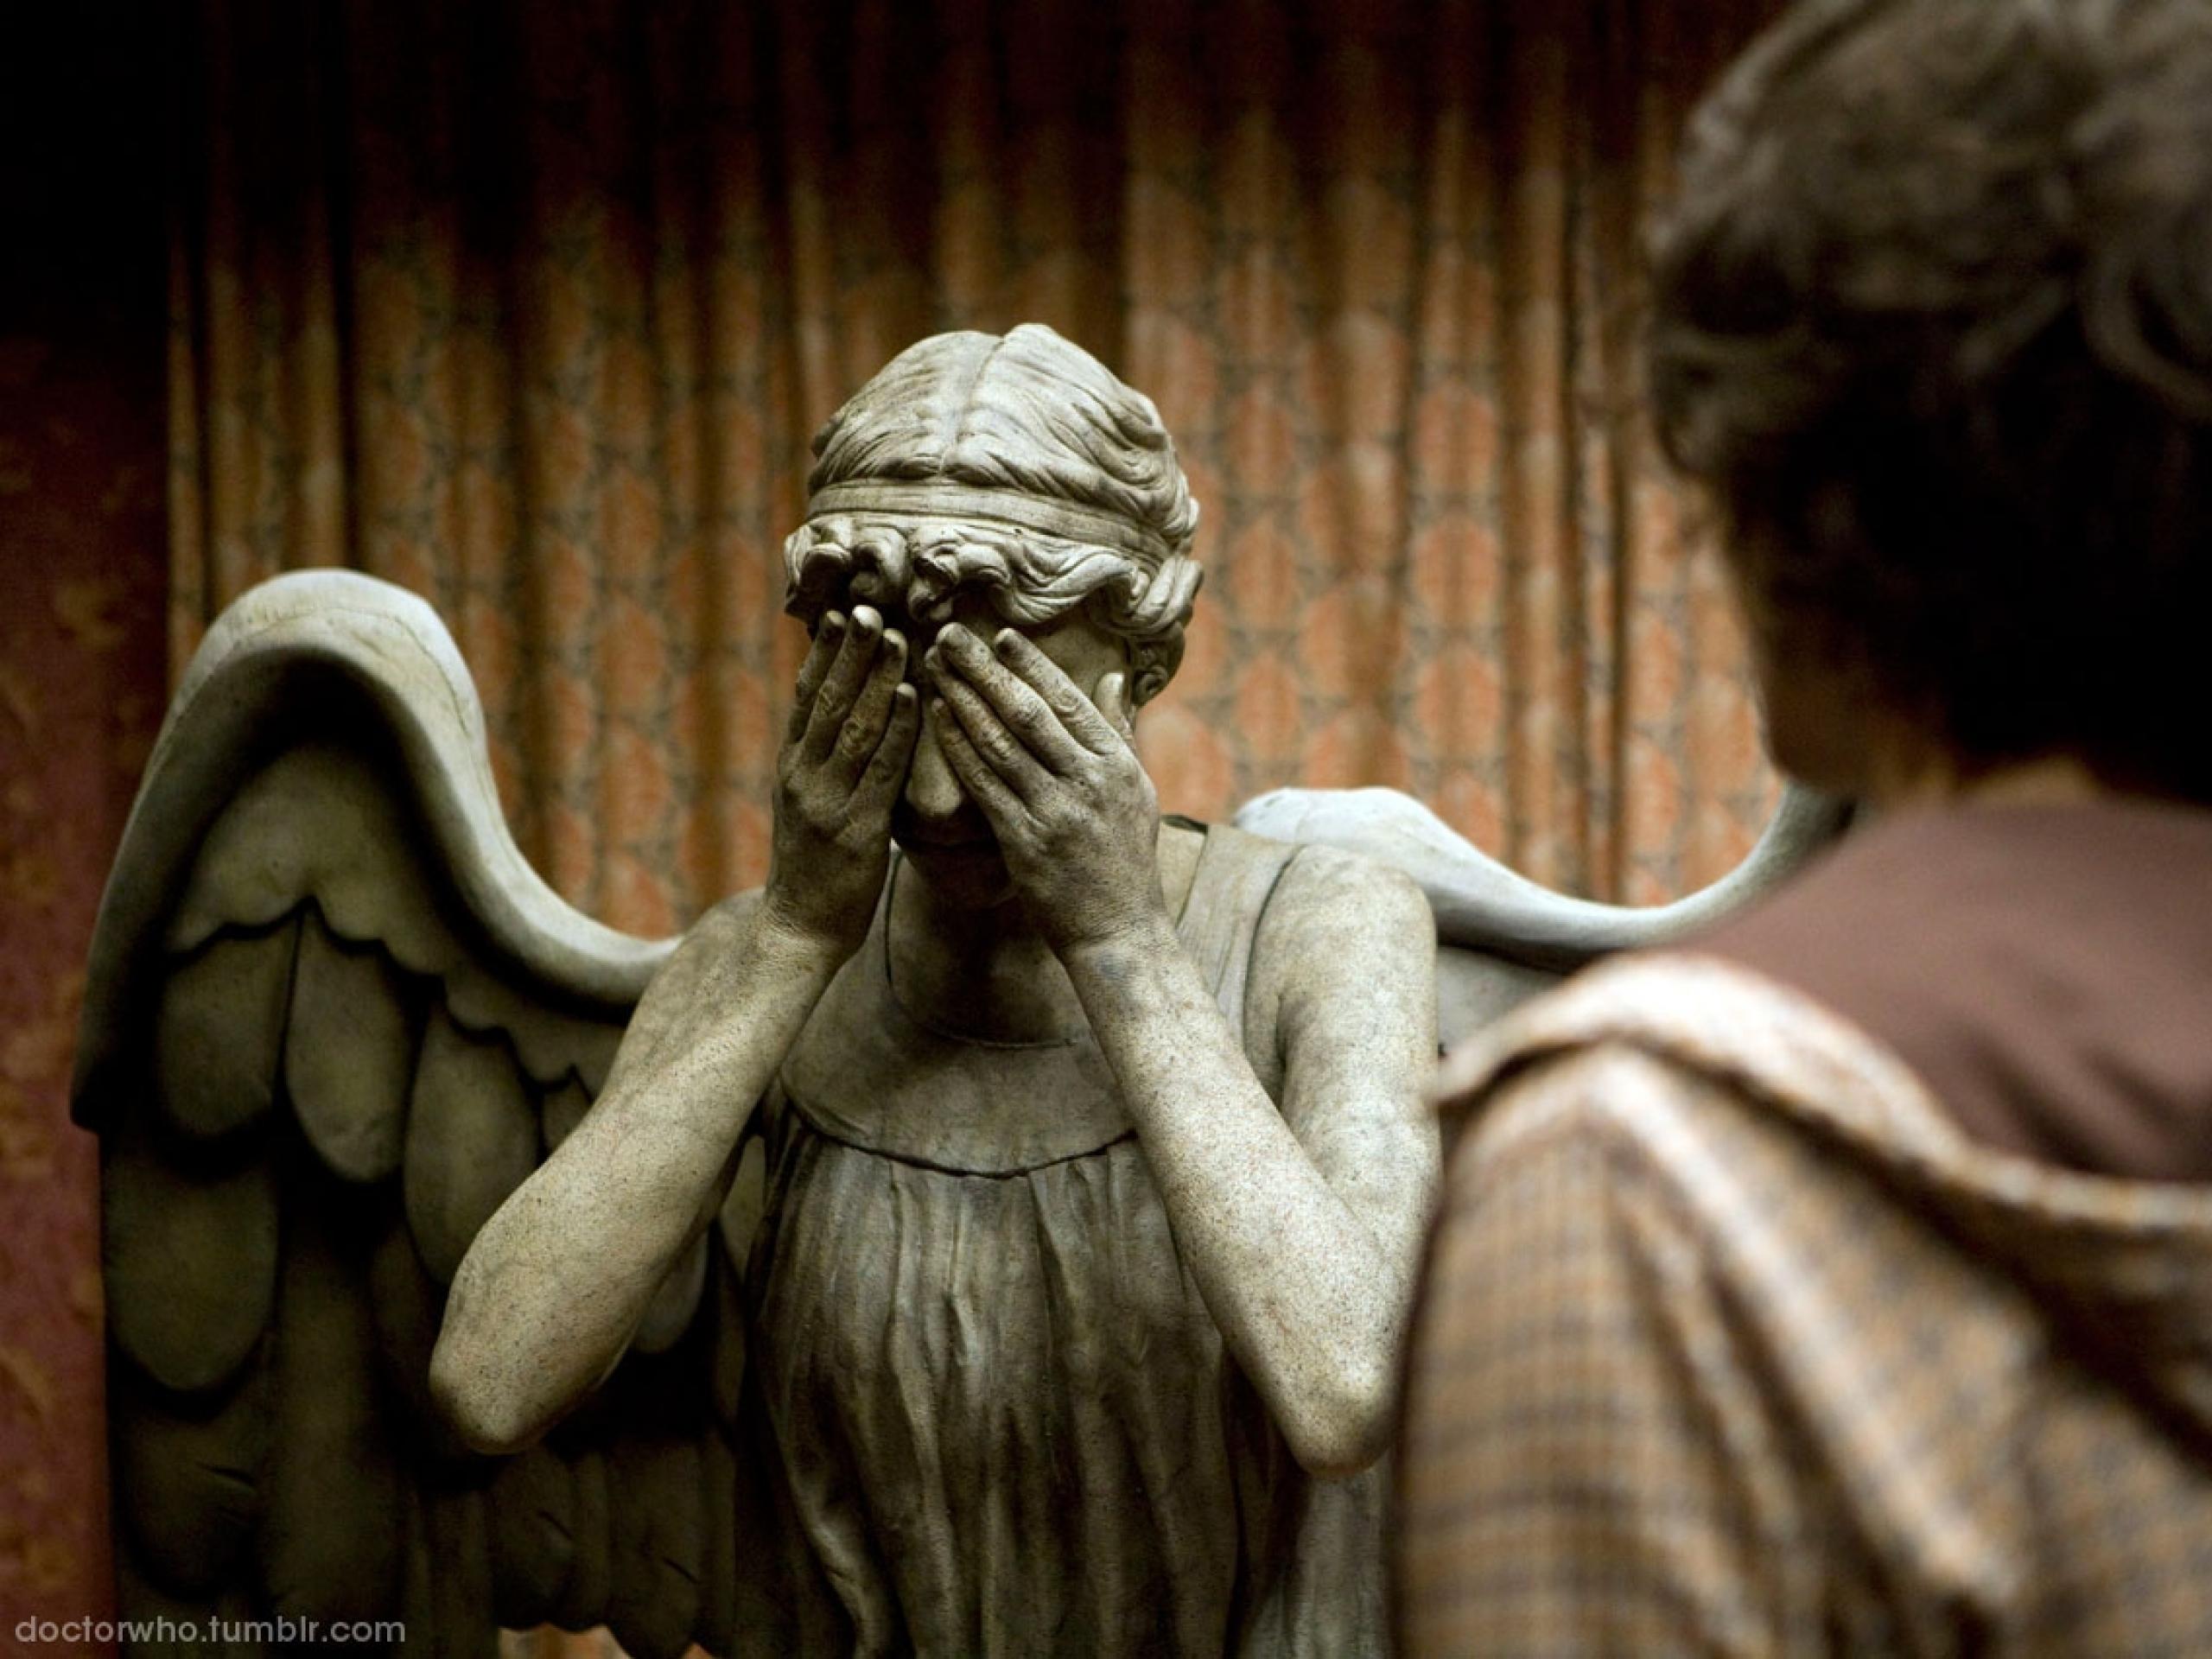 doctor doctor who weeping angel 1280x853 wallpaper Art HD Wallpaper 2560x1920